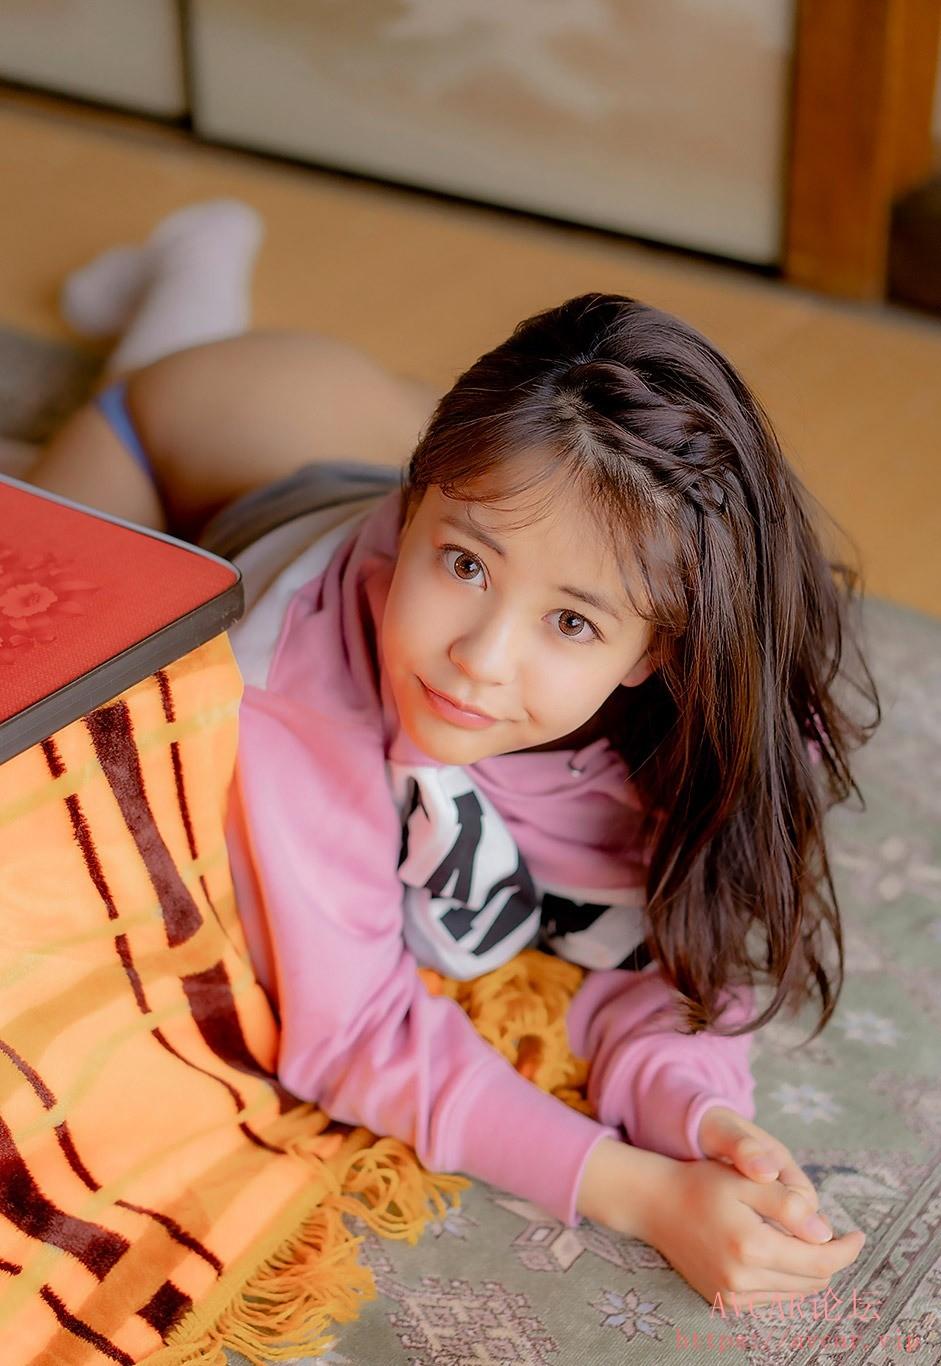 shion-yumi-7.jpg